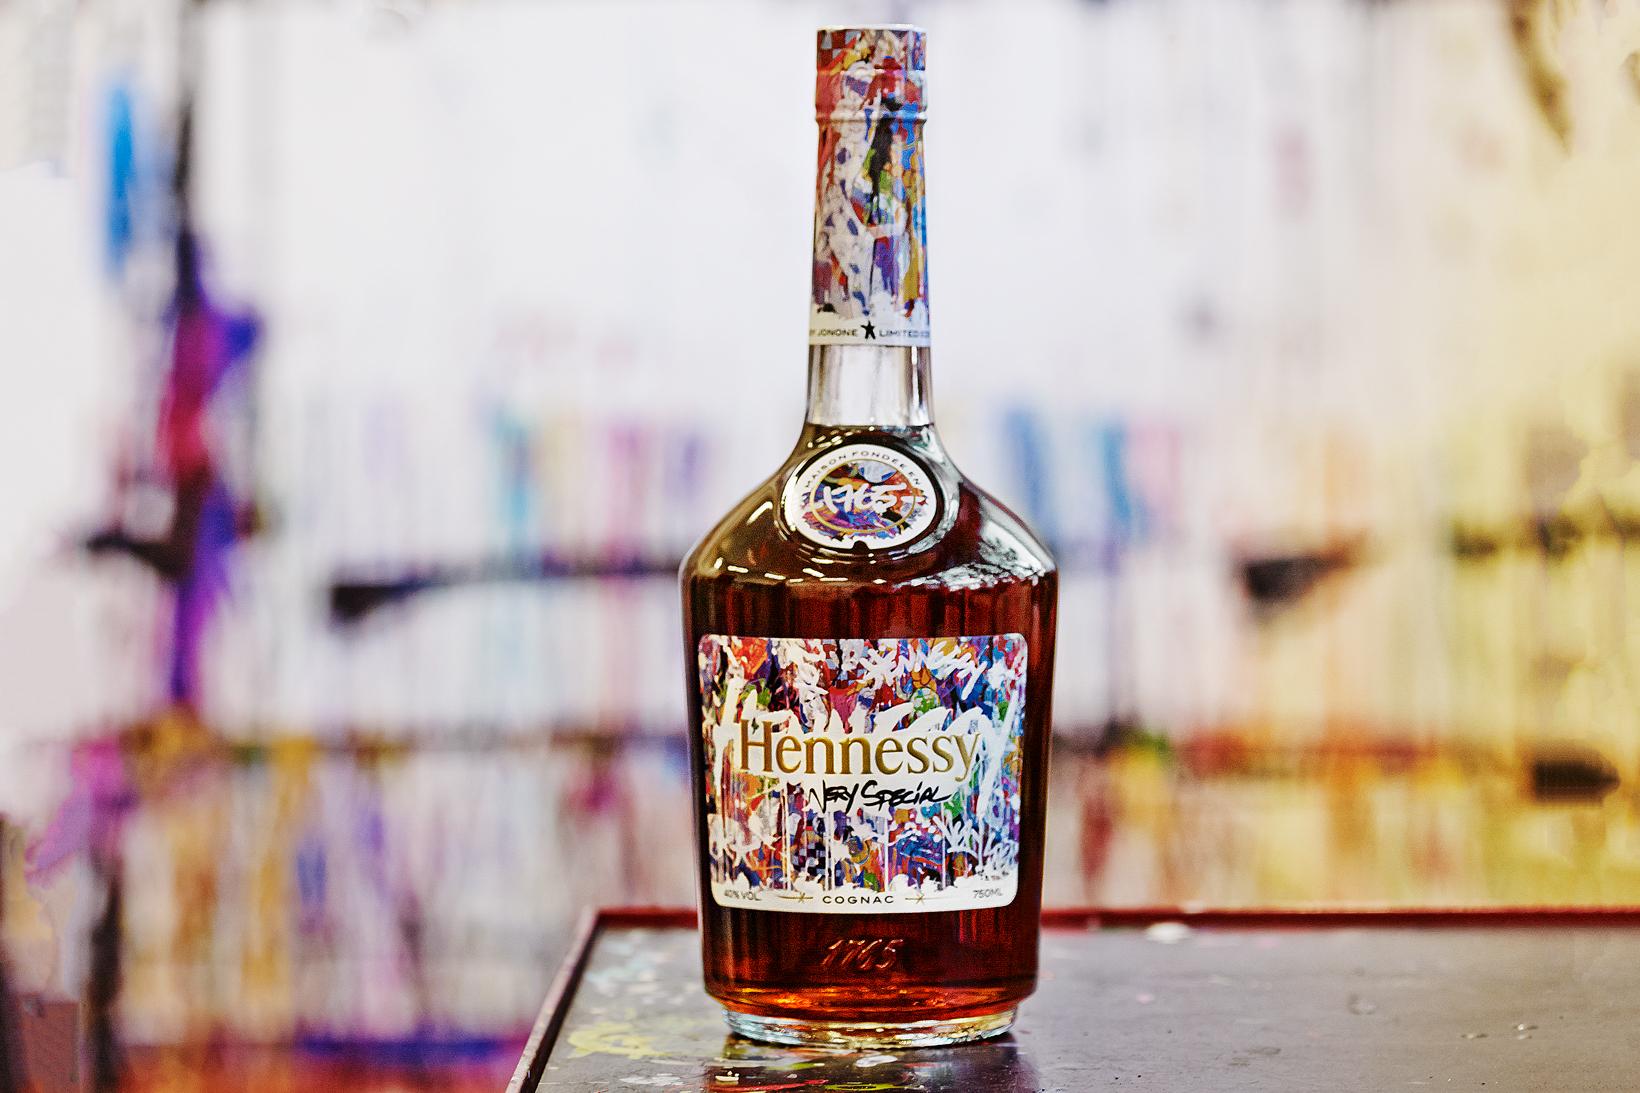 1640x1093 Hennessy Very Special Jonone Artist Bottle Hypebeast